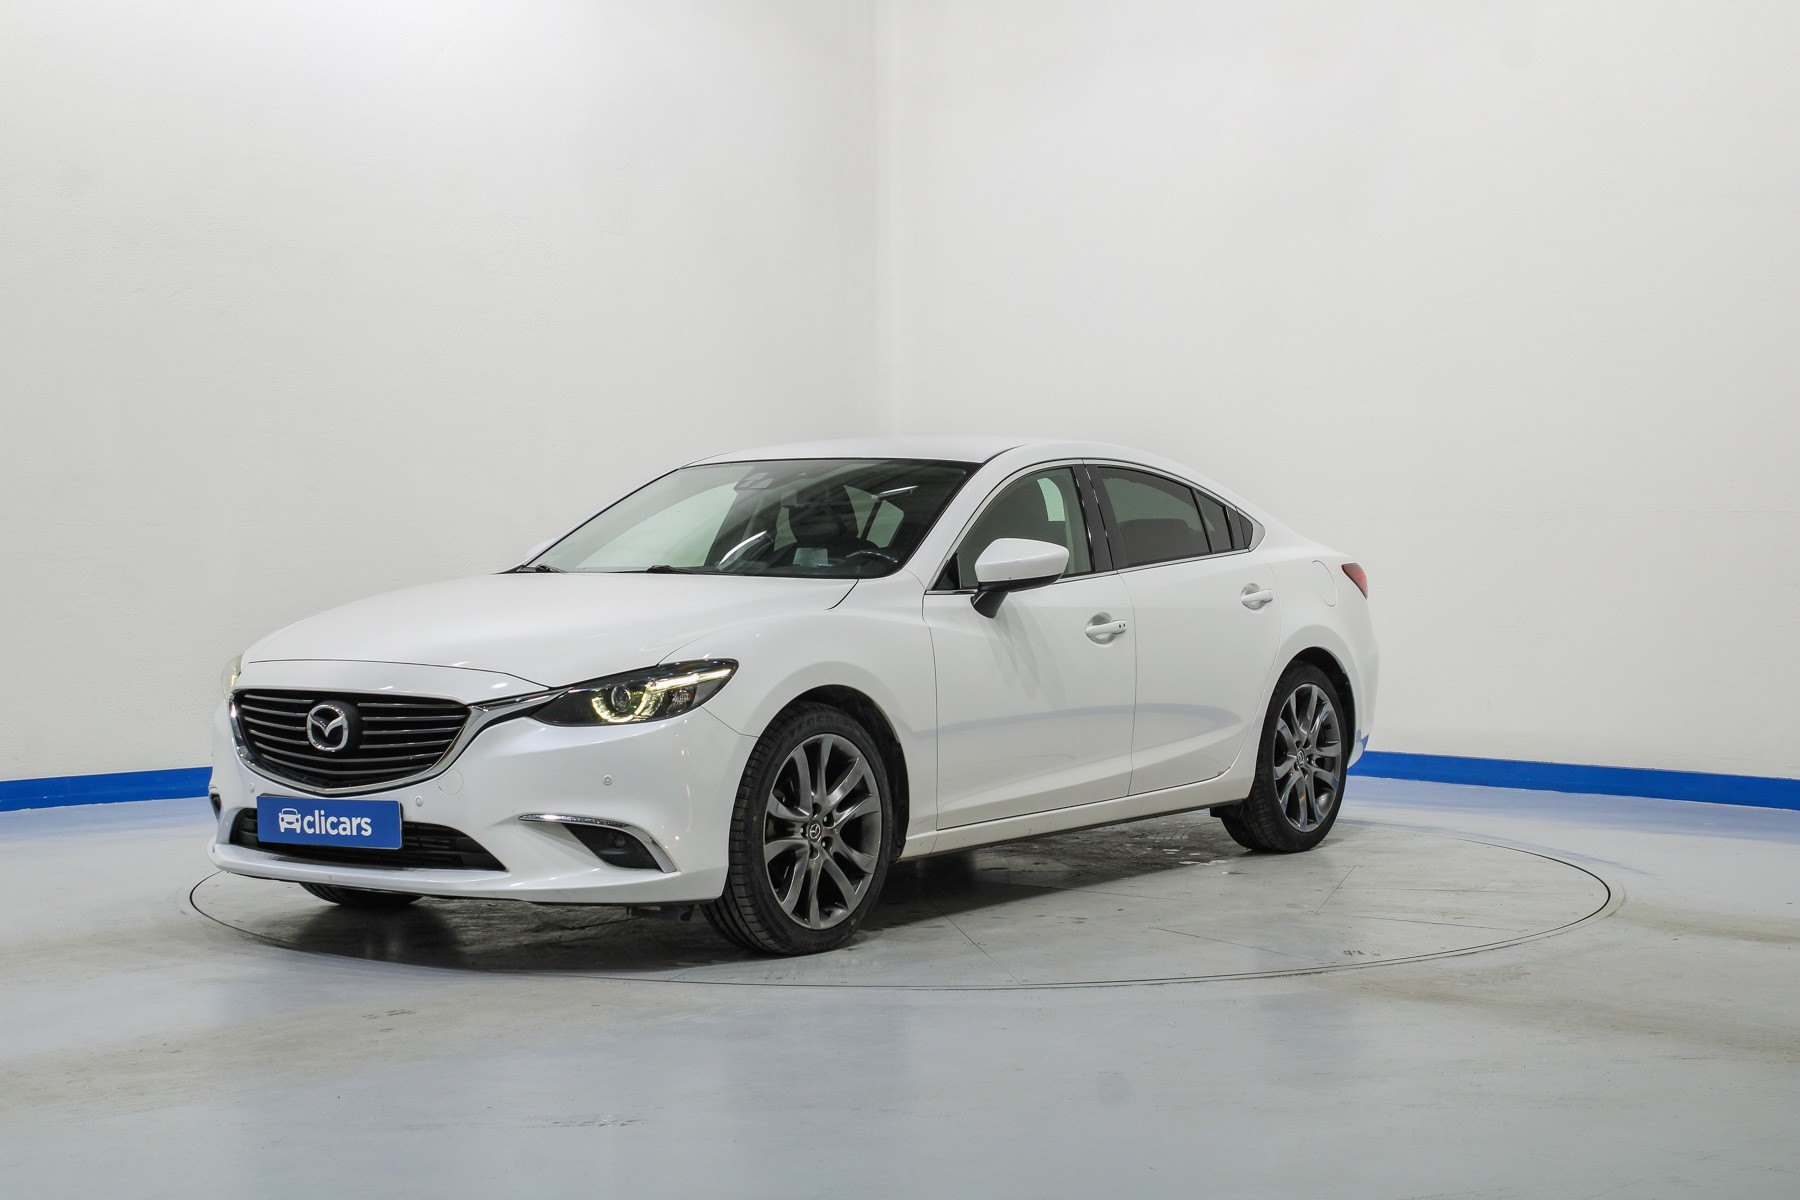 Mazda Mazda6 Diésel 2.2 DE 110kW (150CV) AT Luxury 1